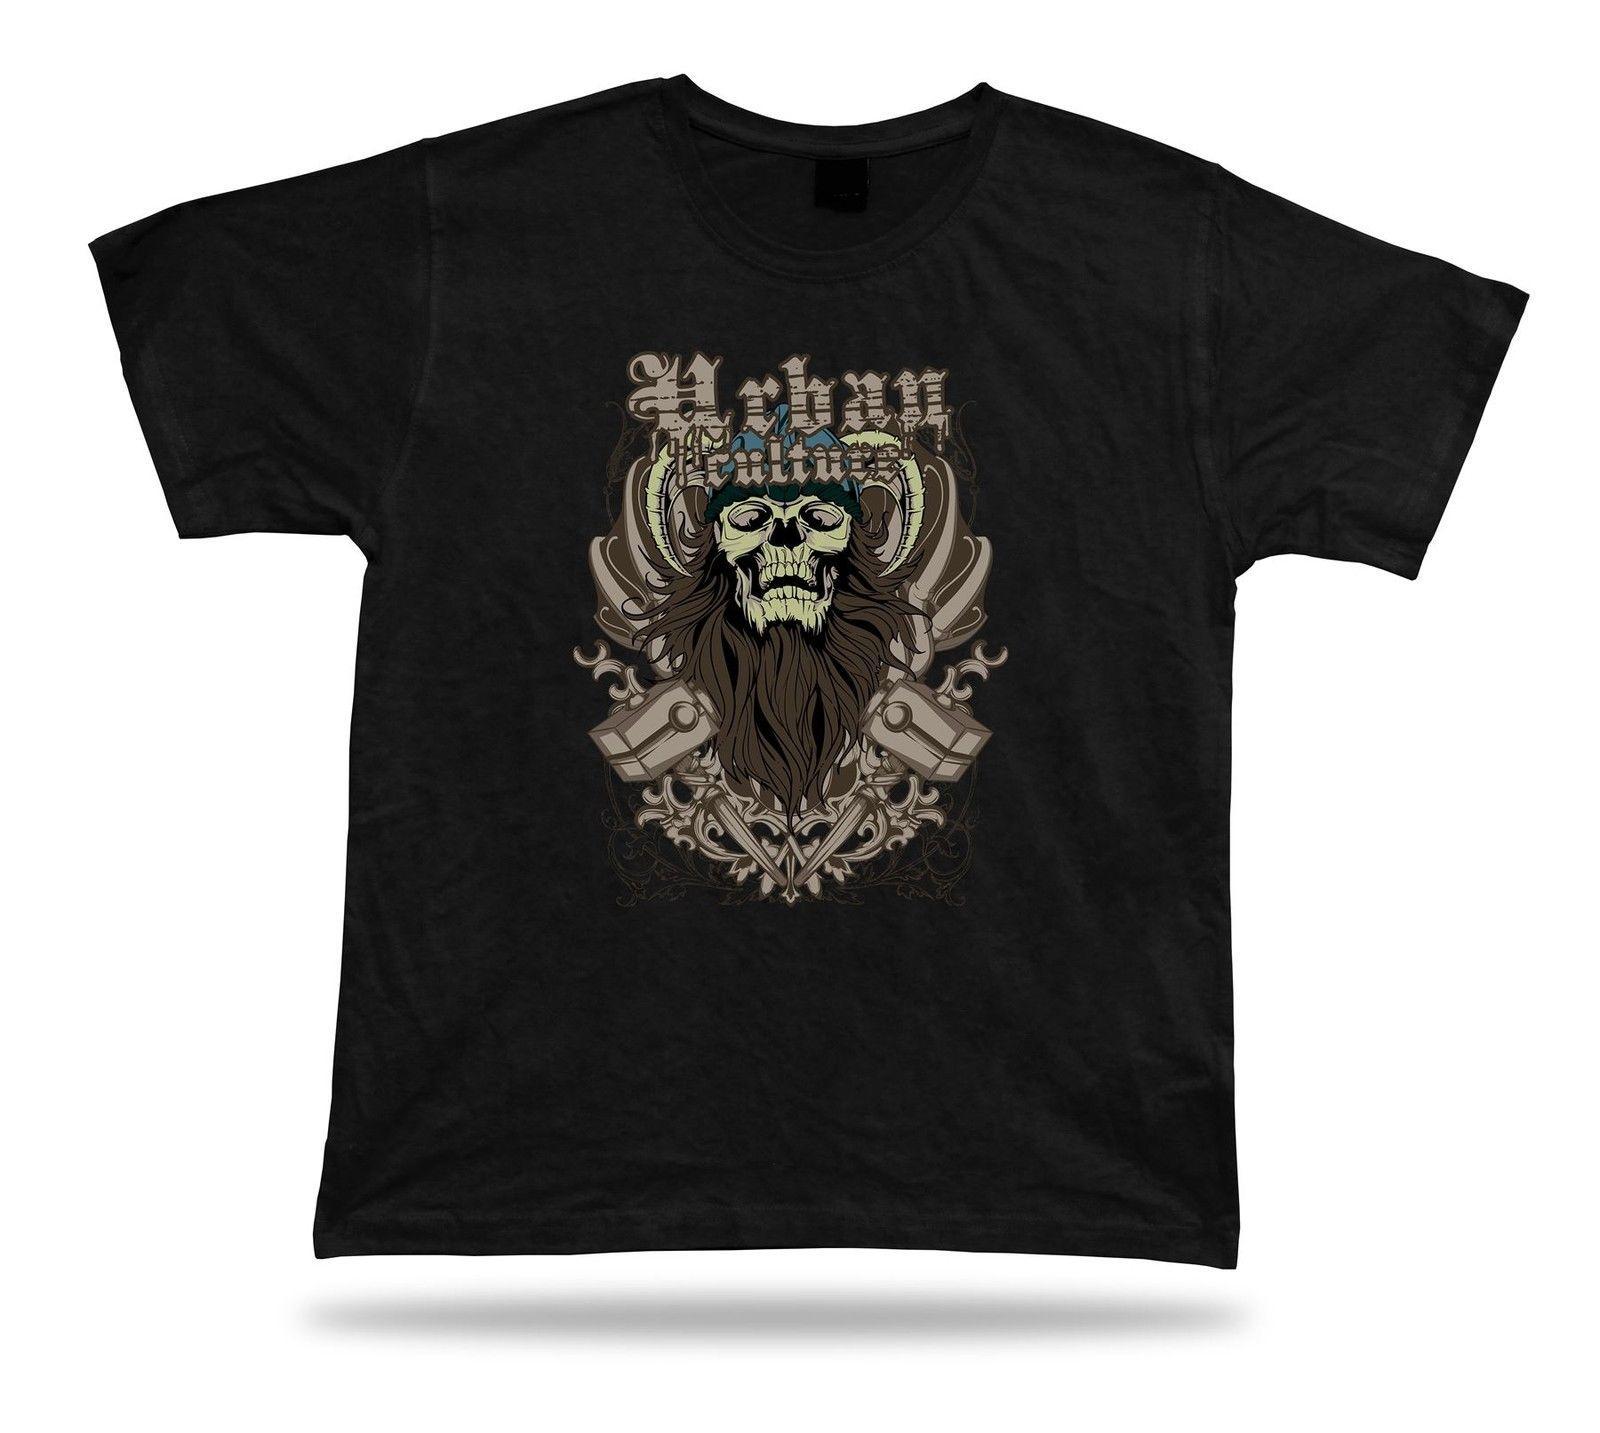 Tshirt Tee Shirt Birthday Gift Idea Urban CultureALICE IN CHAINS TRI CELL BLACK T SHIRT NEW OFFICIAL ADULT Men Women Unisex Fashion